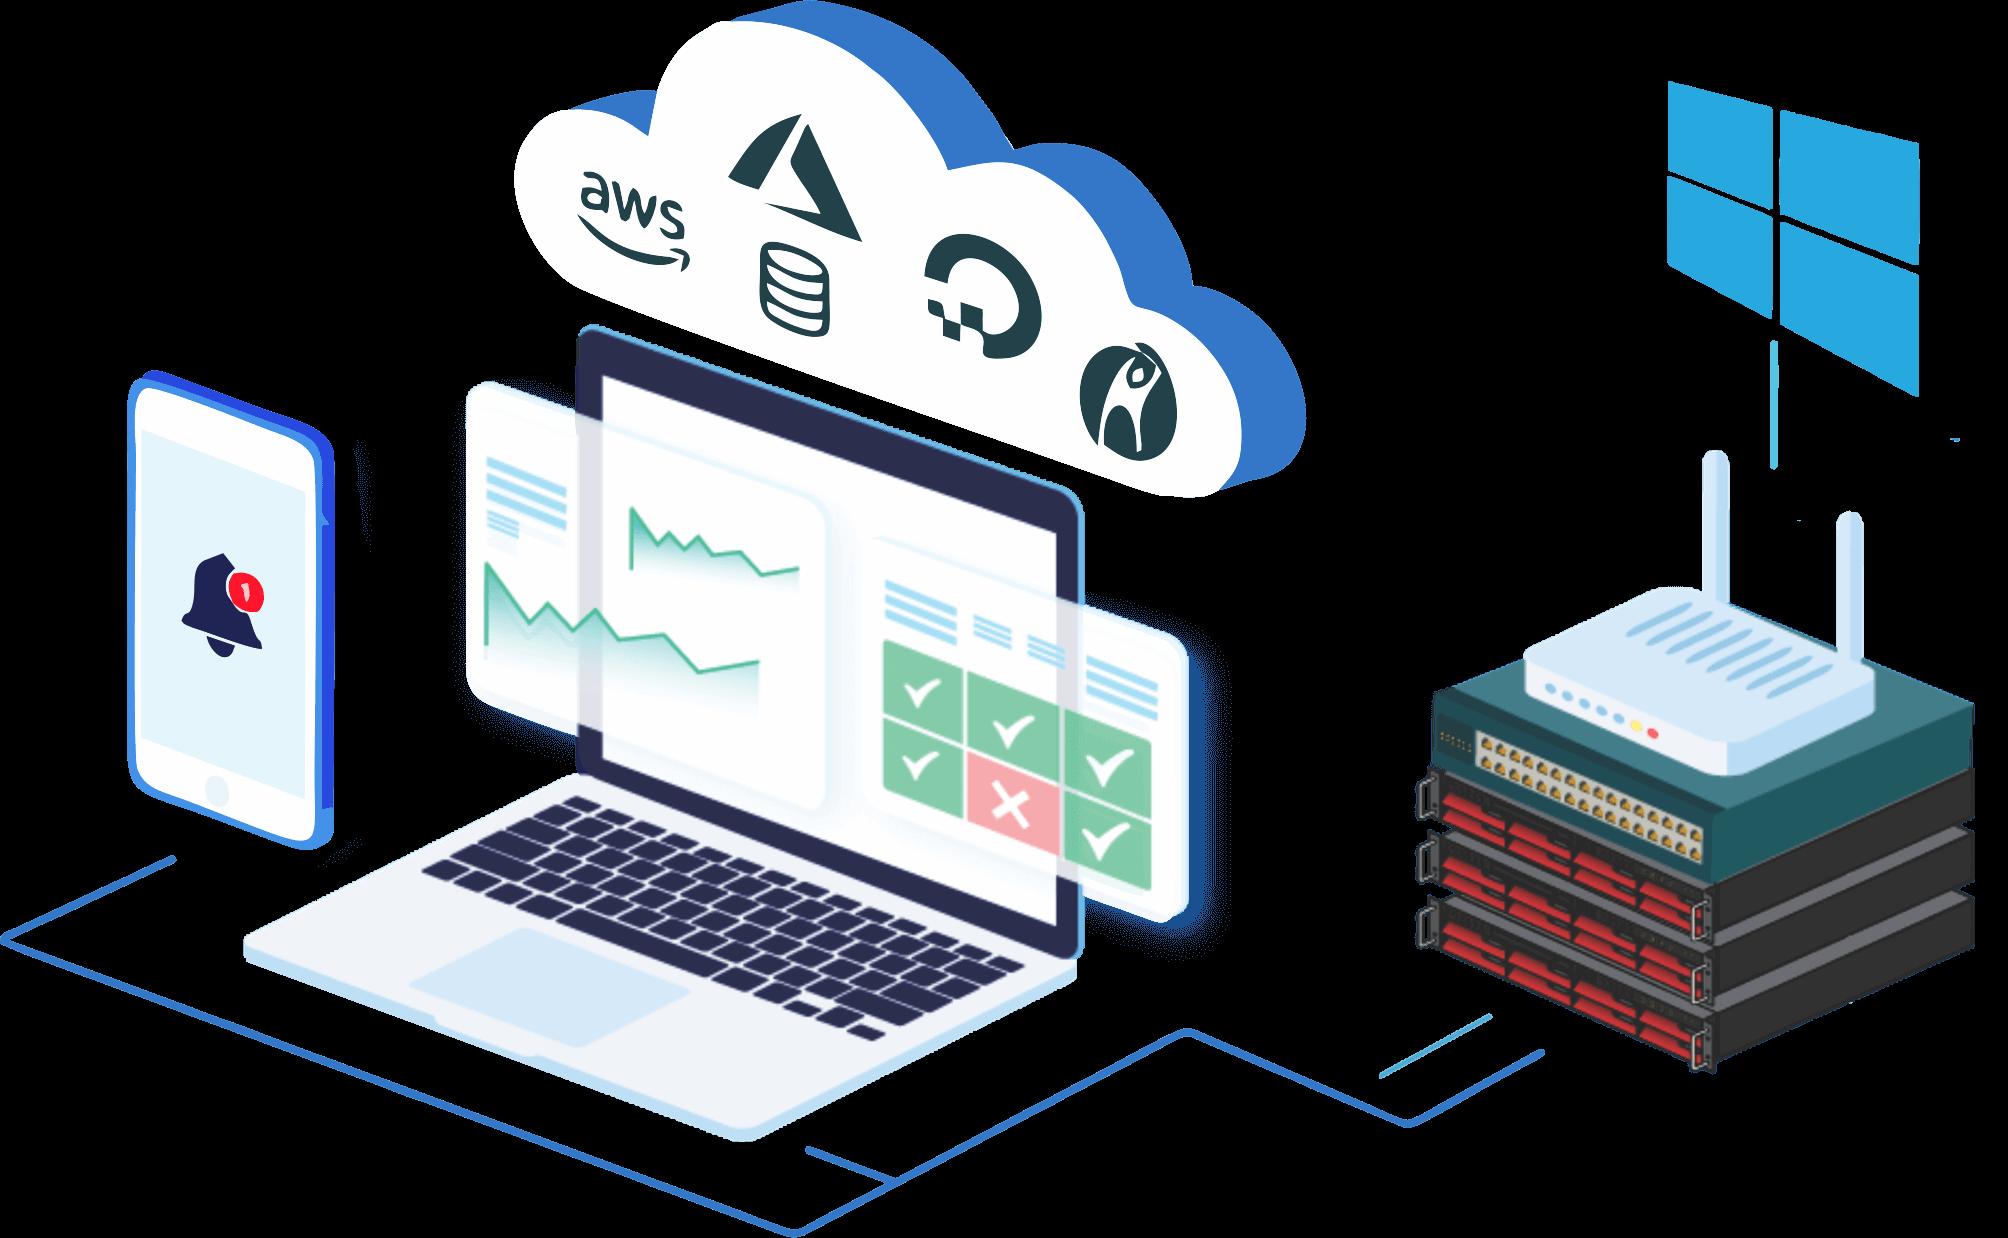 Windows Server Monitoring - Made Radically Simple